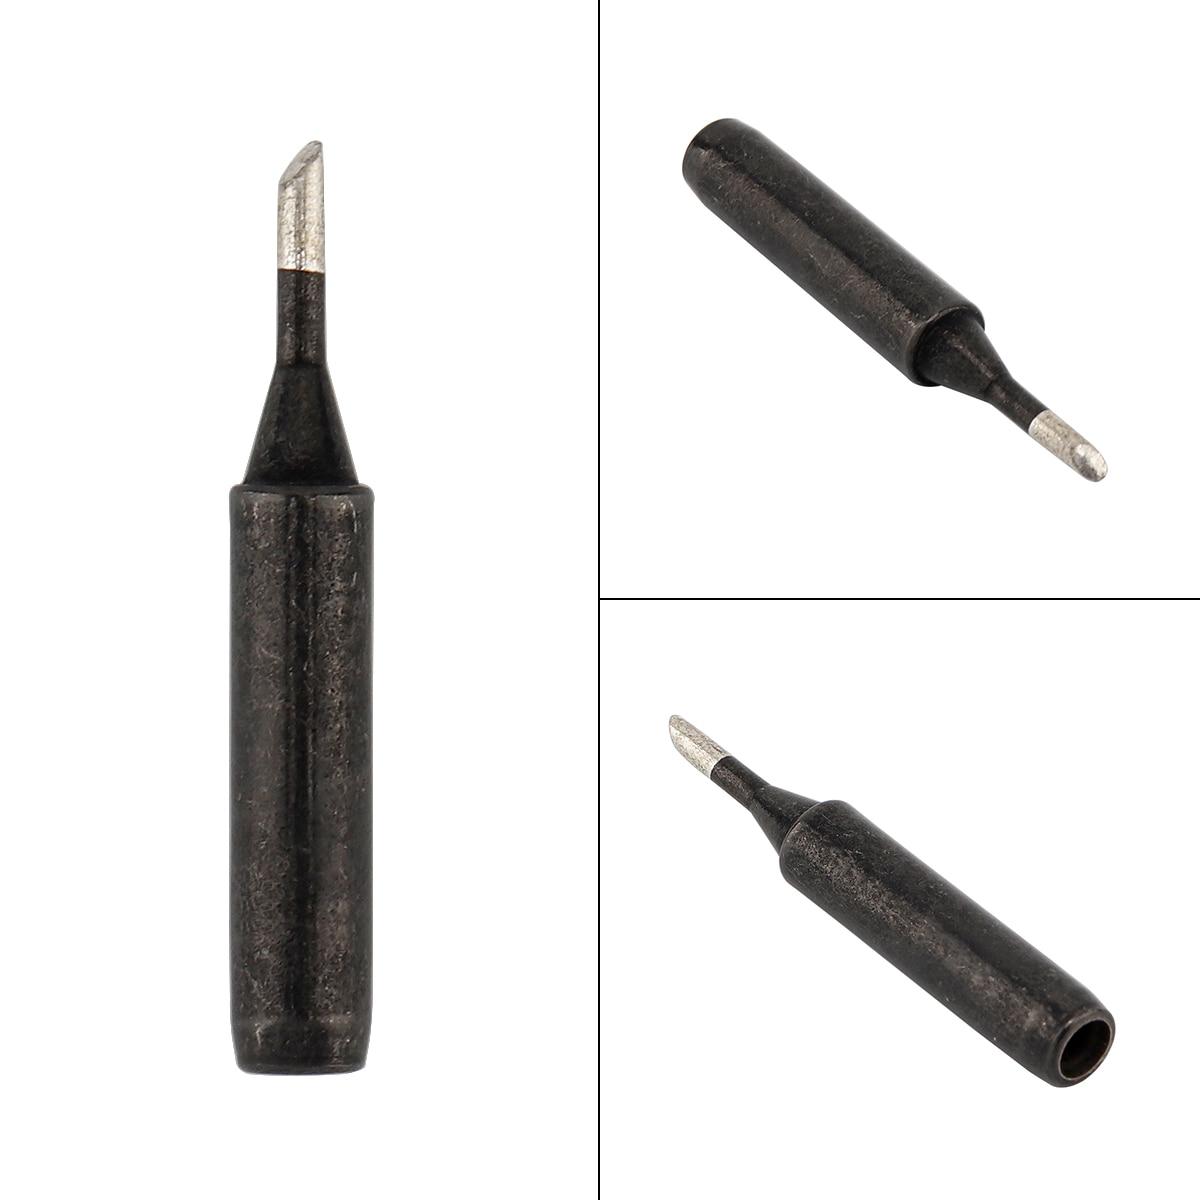 900M-T-2C Portable Solder Tip Lead-free Black Metal Soldering Iron Tips For Hakko / 936 Soldering Rework Station